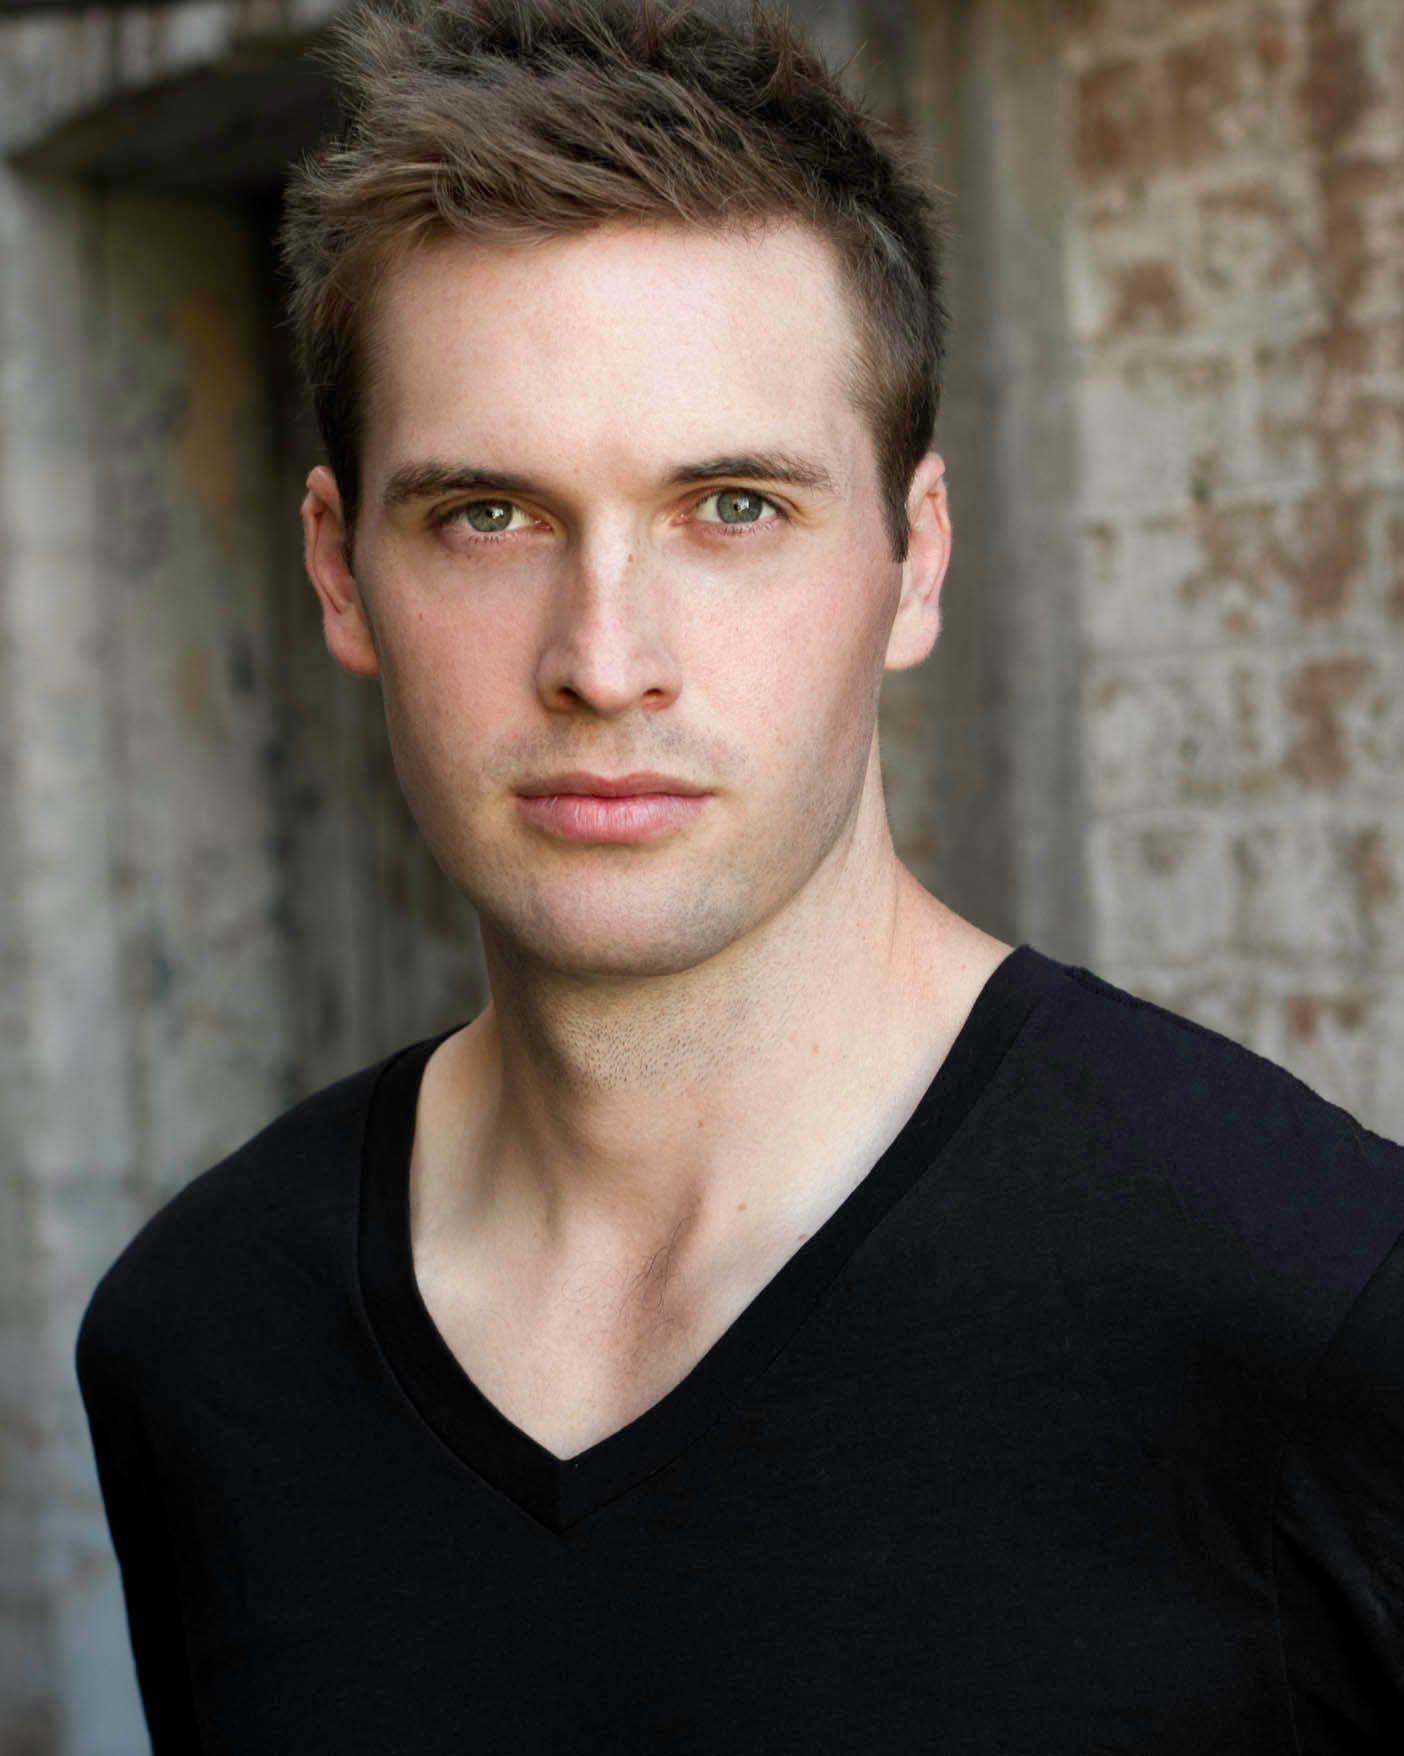 Marlton Voice Actor